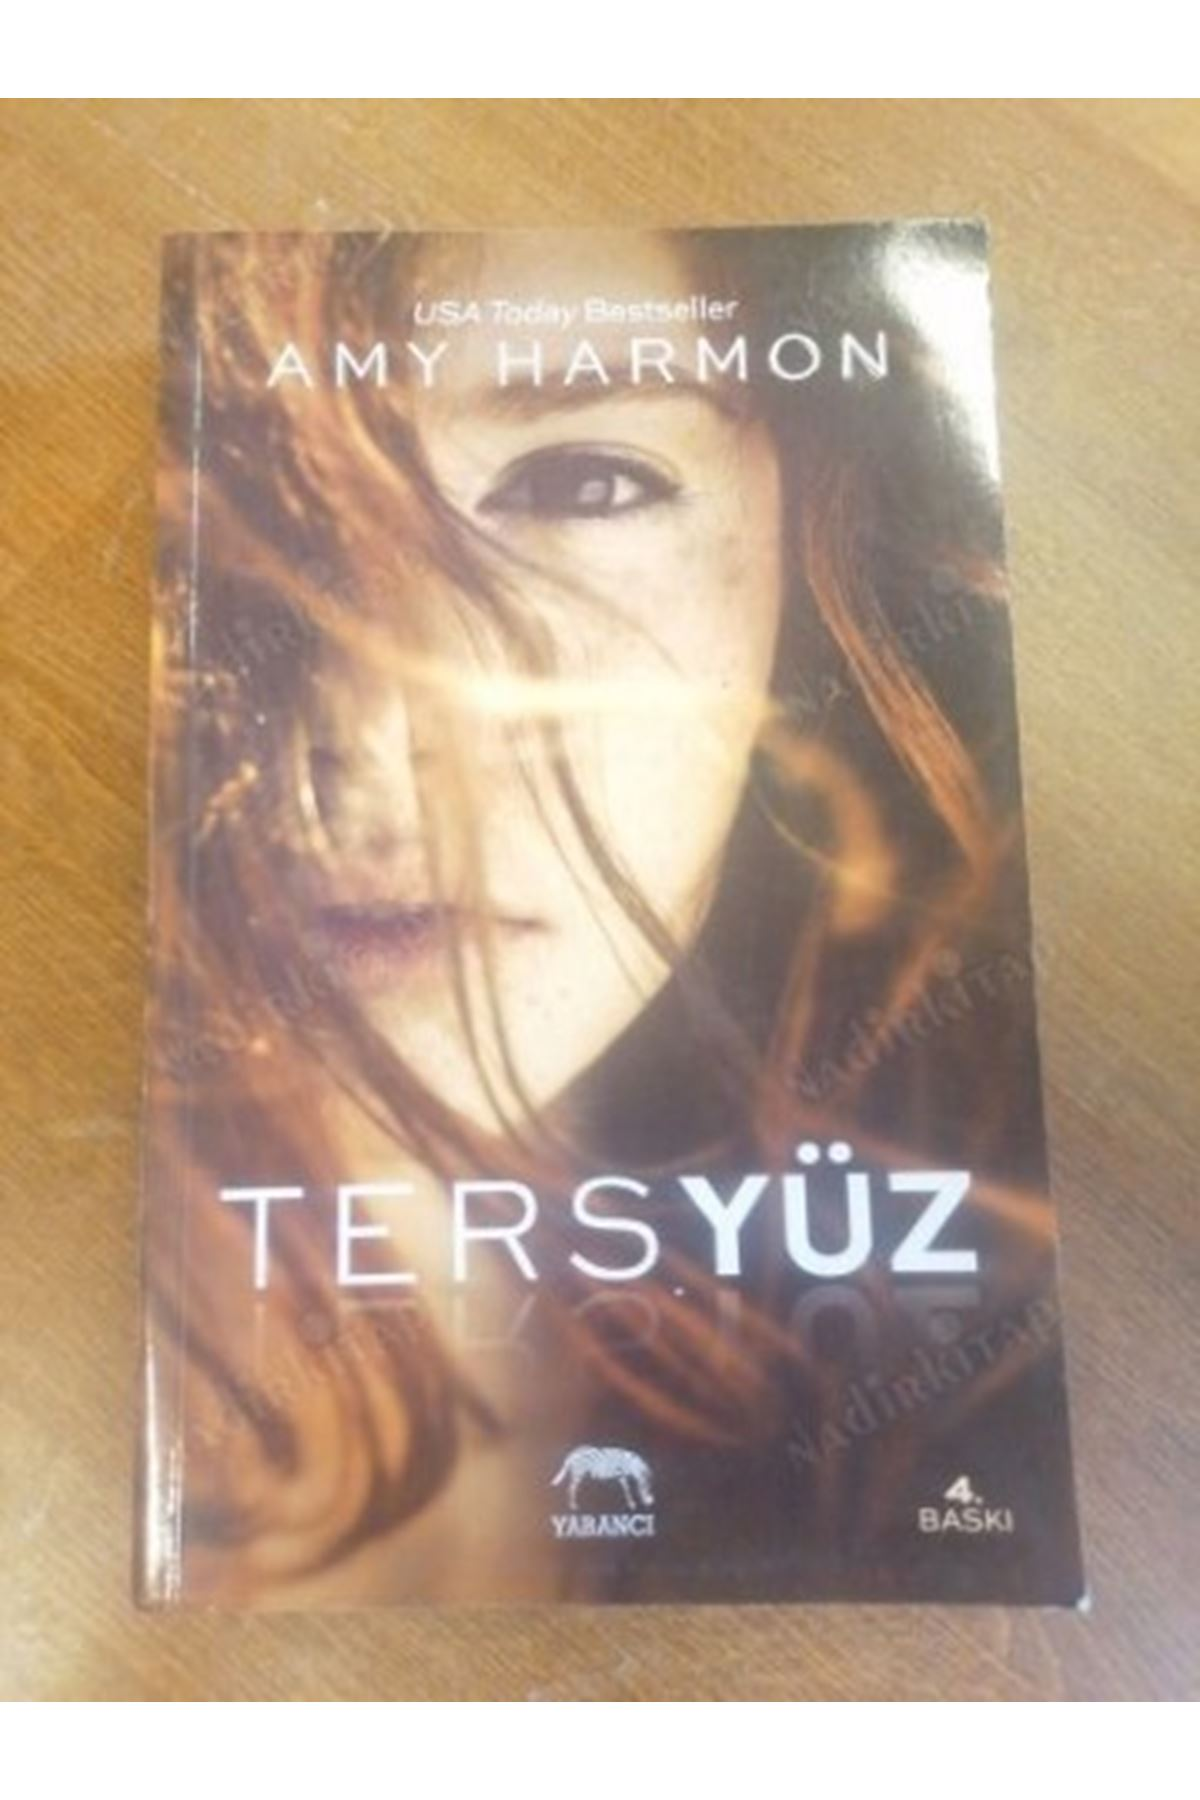 AMY HARMON - TERSYÜZ